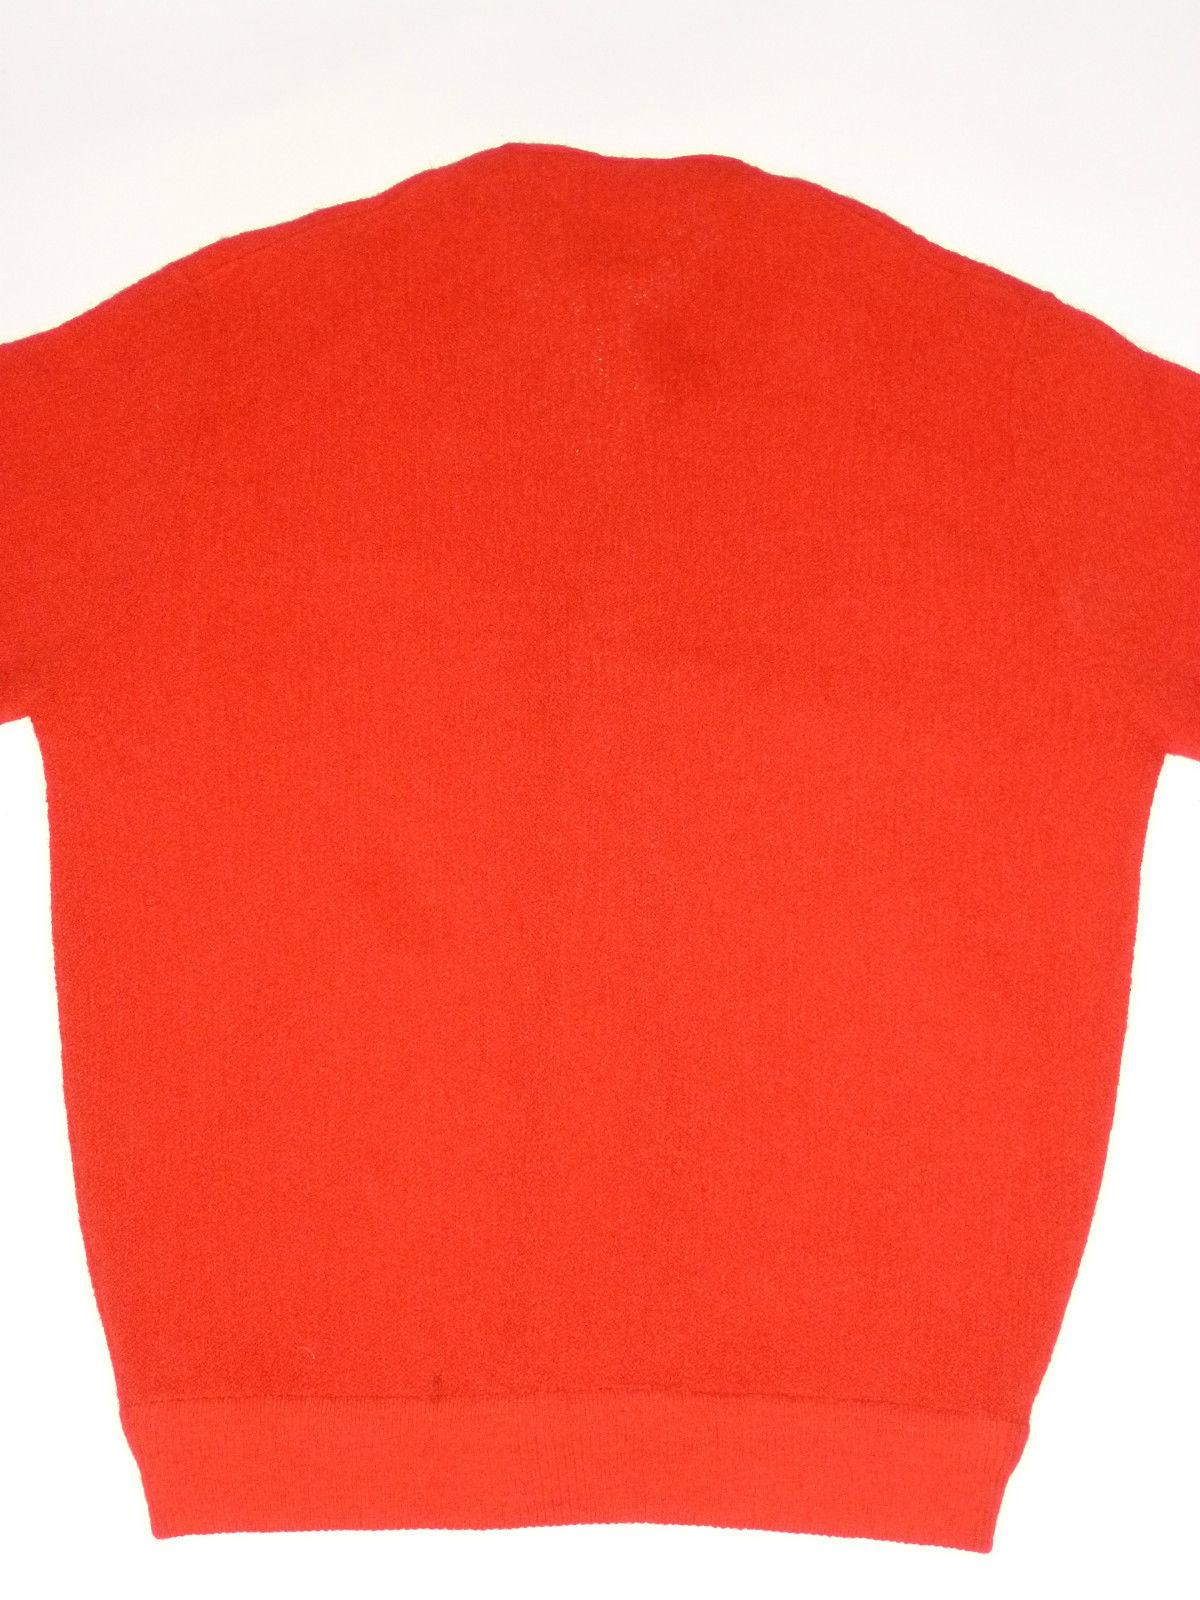 1960s Jantzen Cardigan Sweater | Classic Vintage Apparel